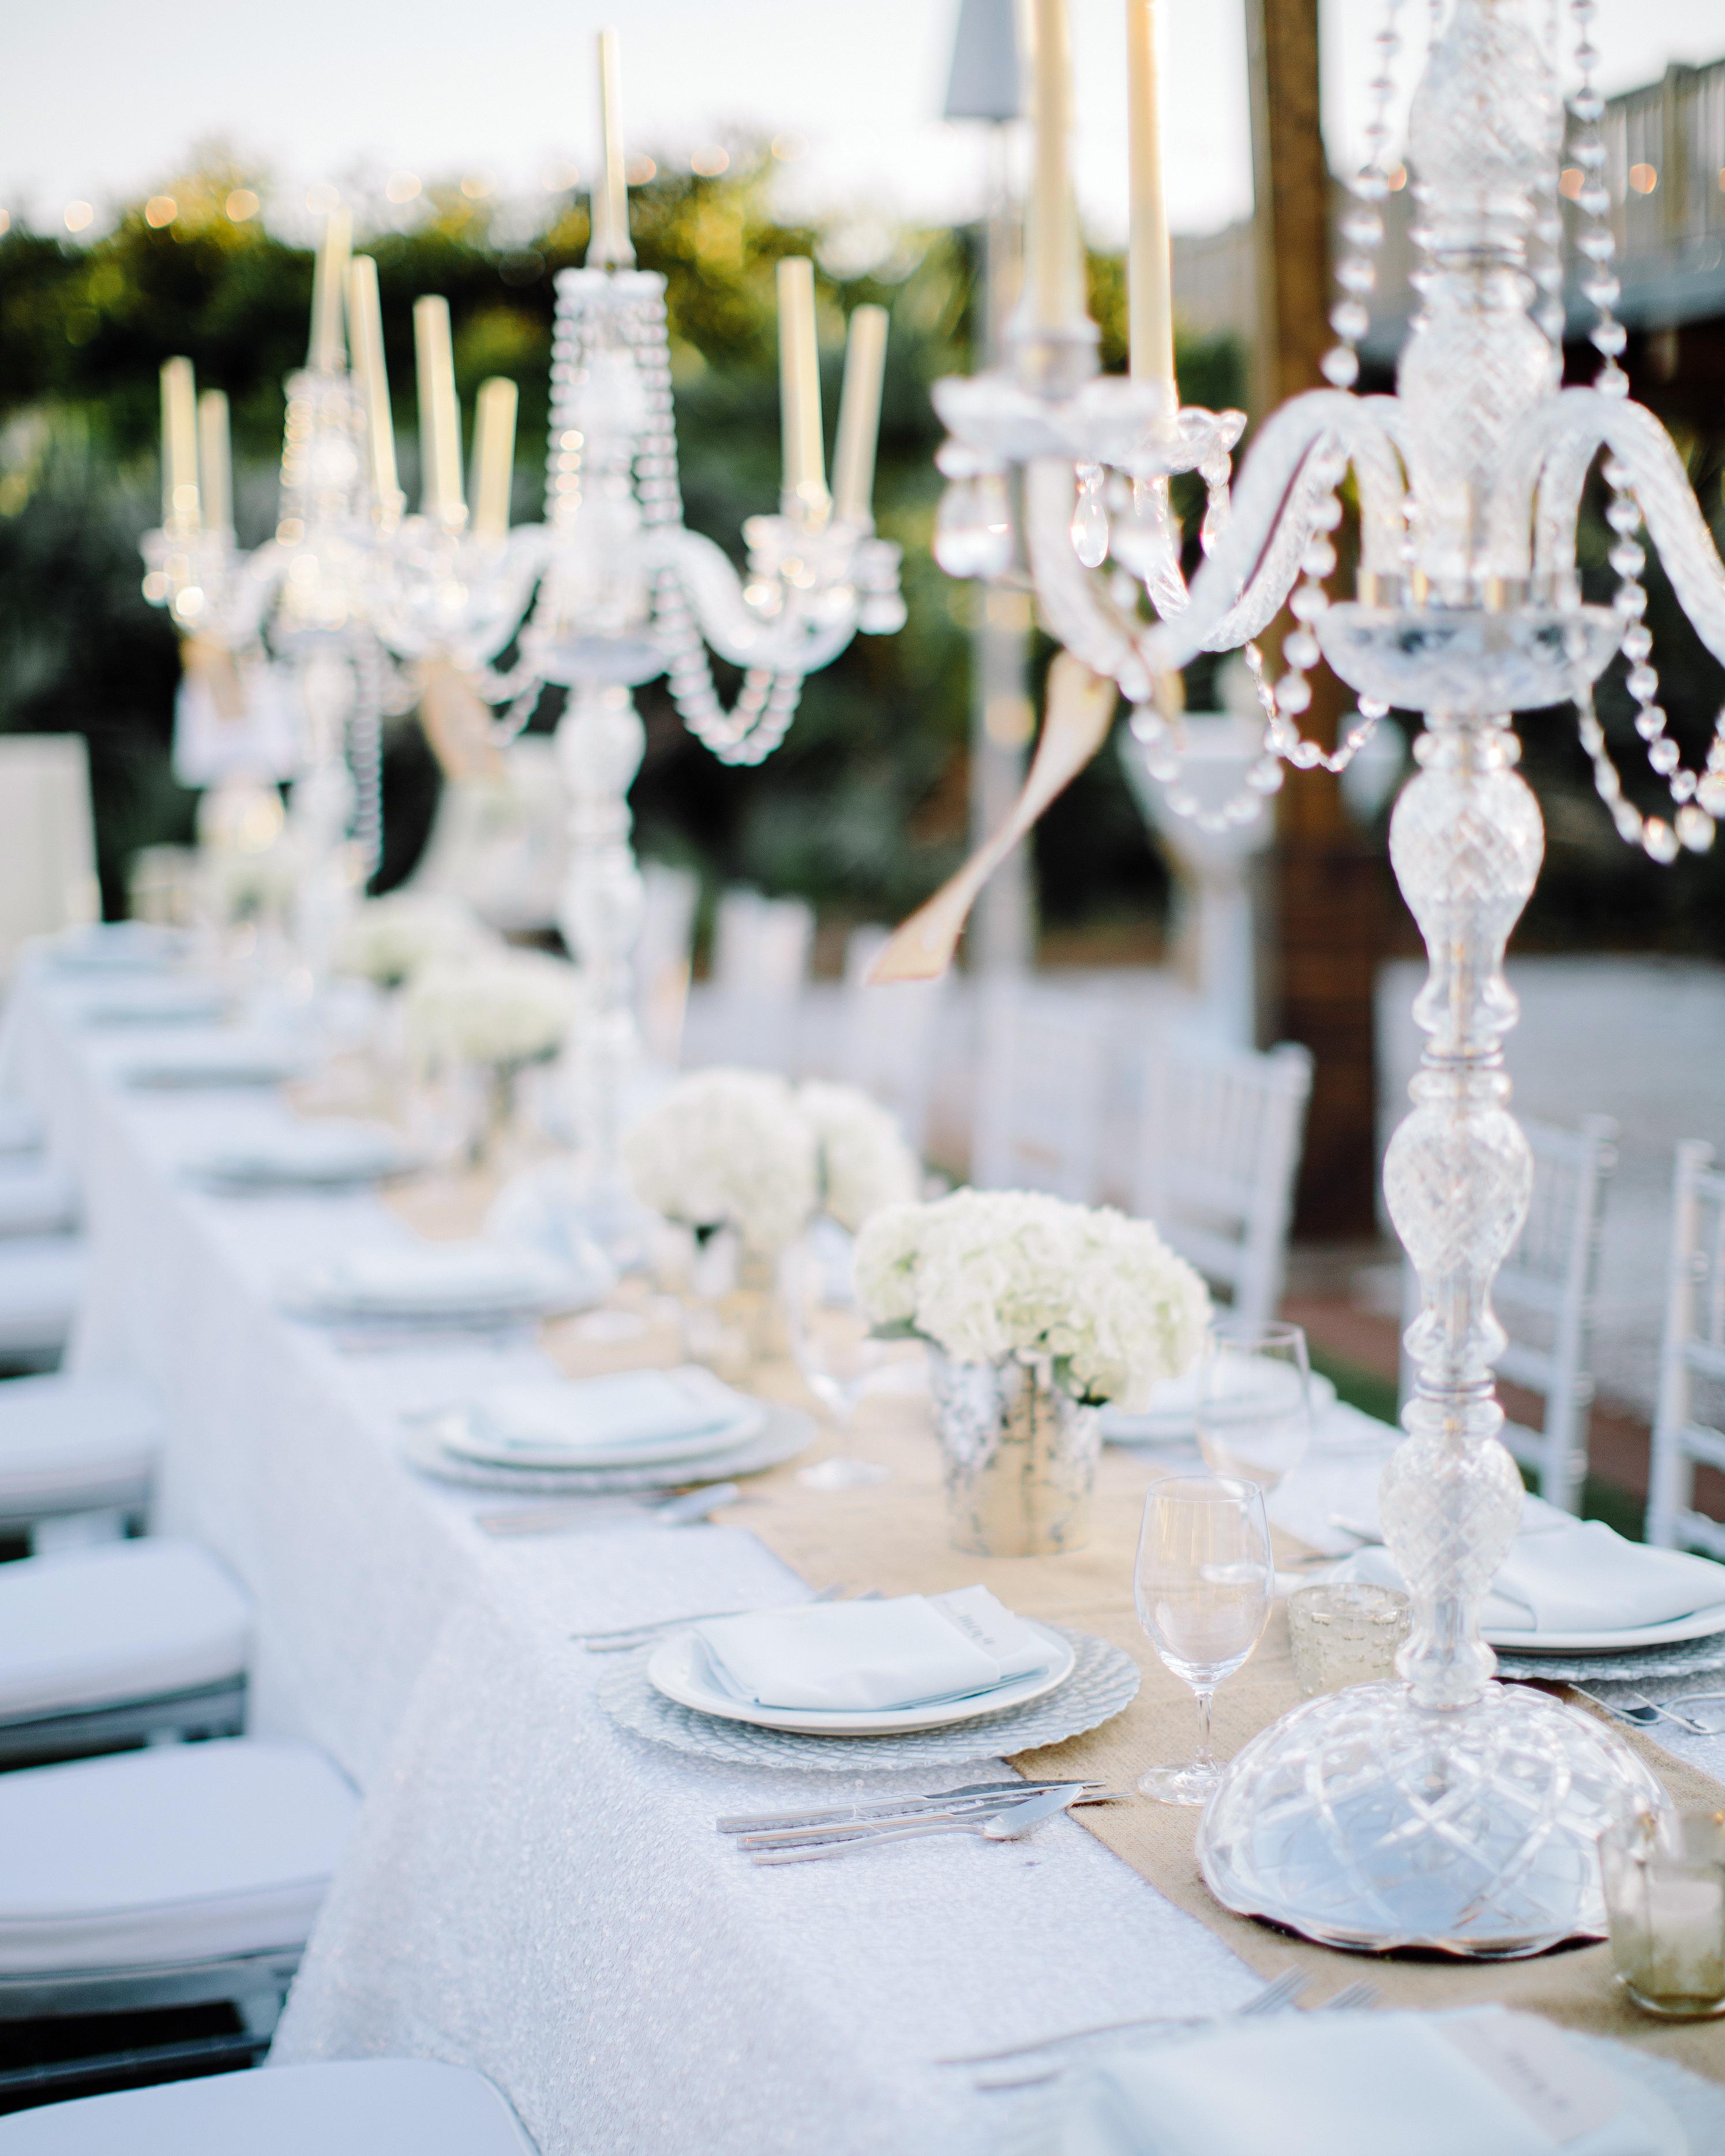 teresa-amanda-wedding-tables-0090-s111694-1114.jpg